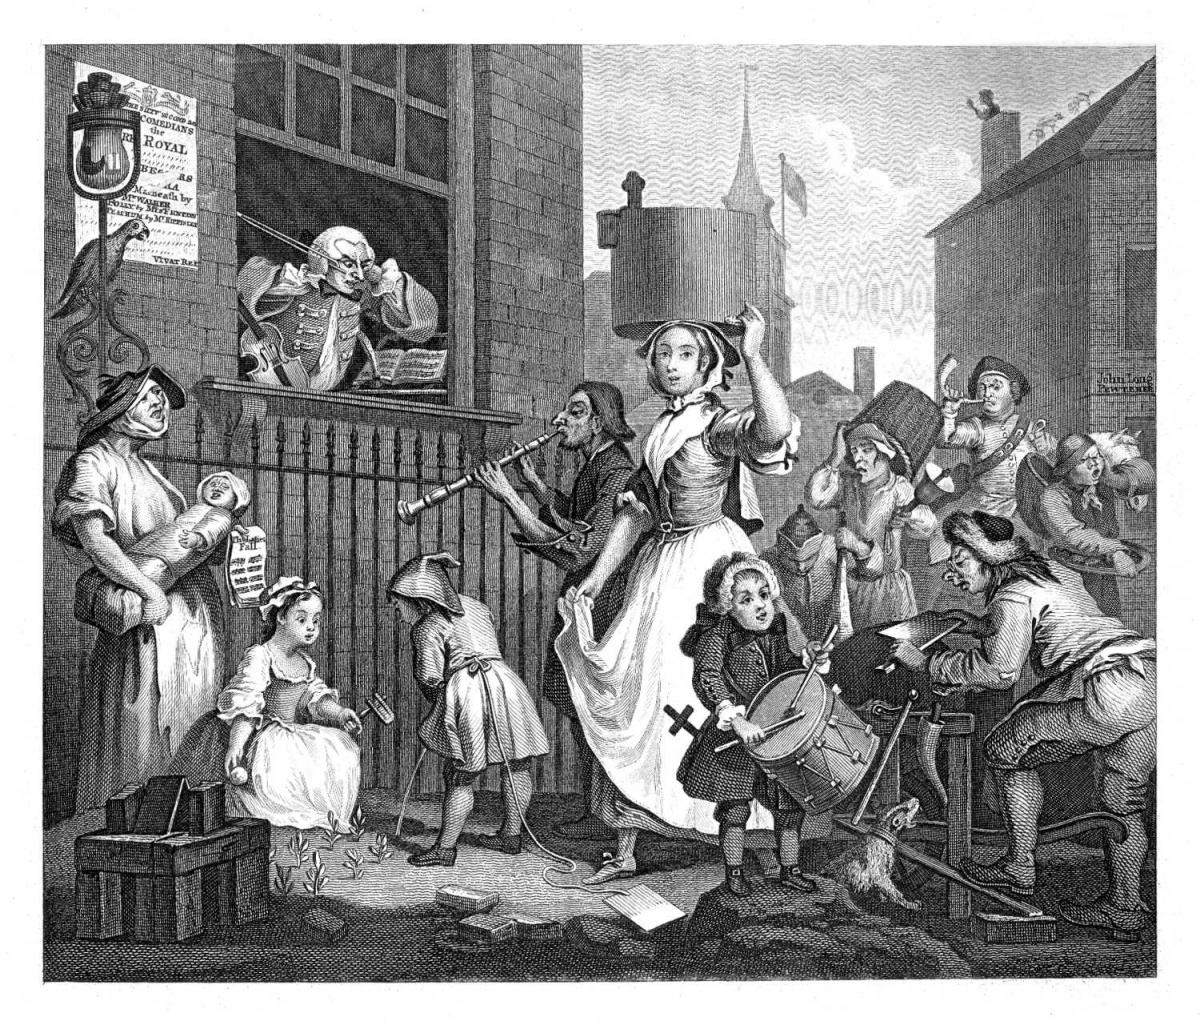 The Enraged Musician, Hogarth